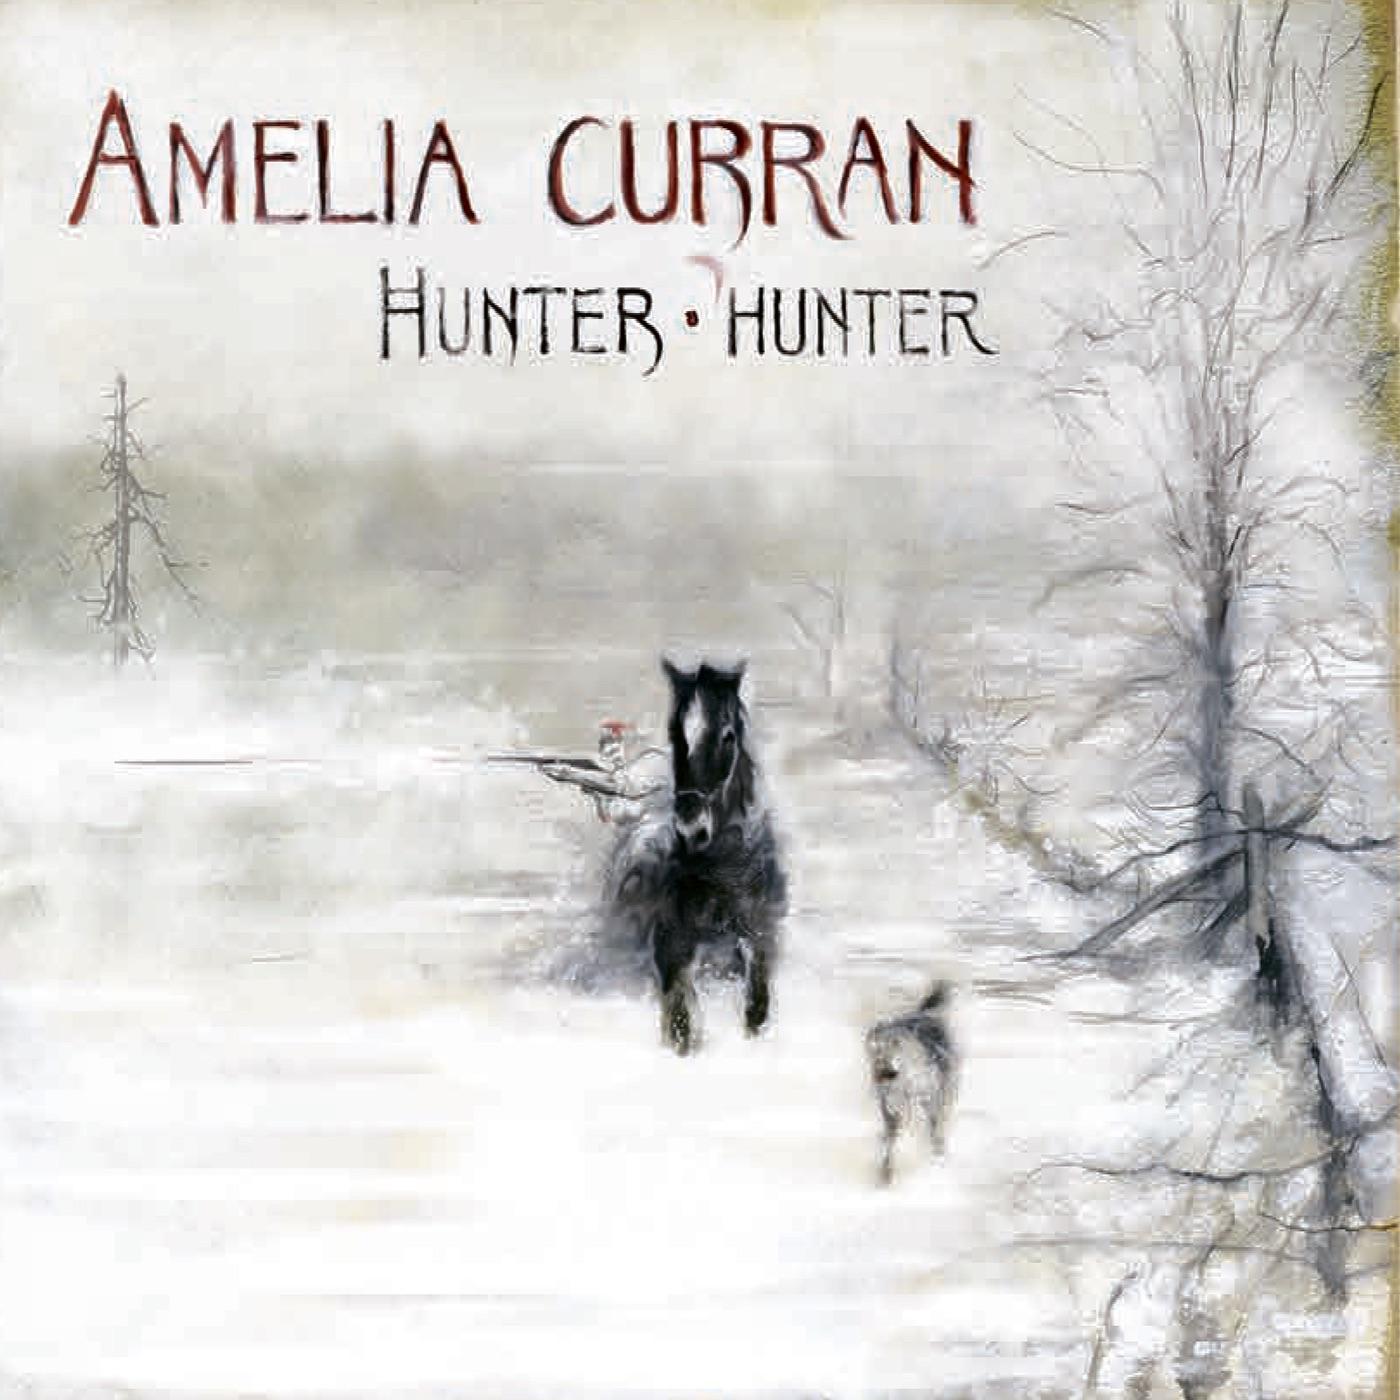 AmeliaCurran-Hunter.jpg